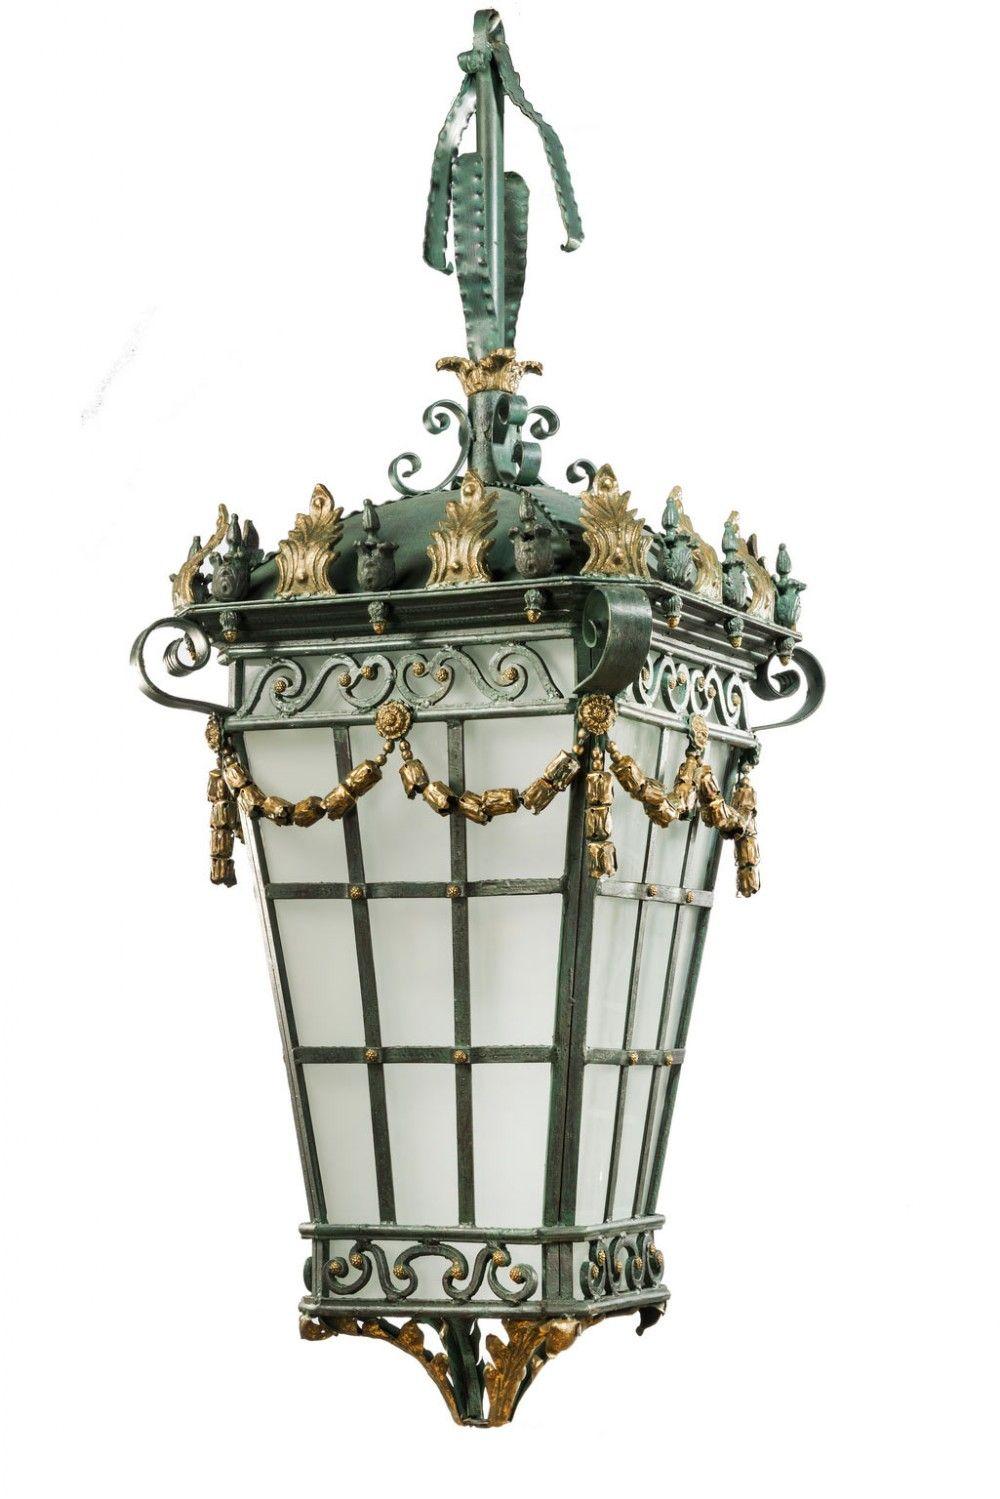 Early 19th Century Bronze Lantern 346887 Antique Lanterns Lanterns Antiques For Sale